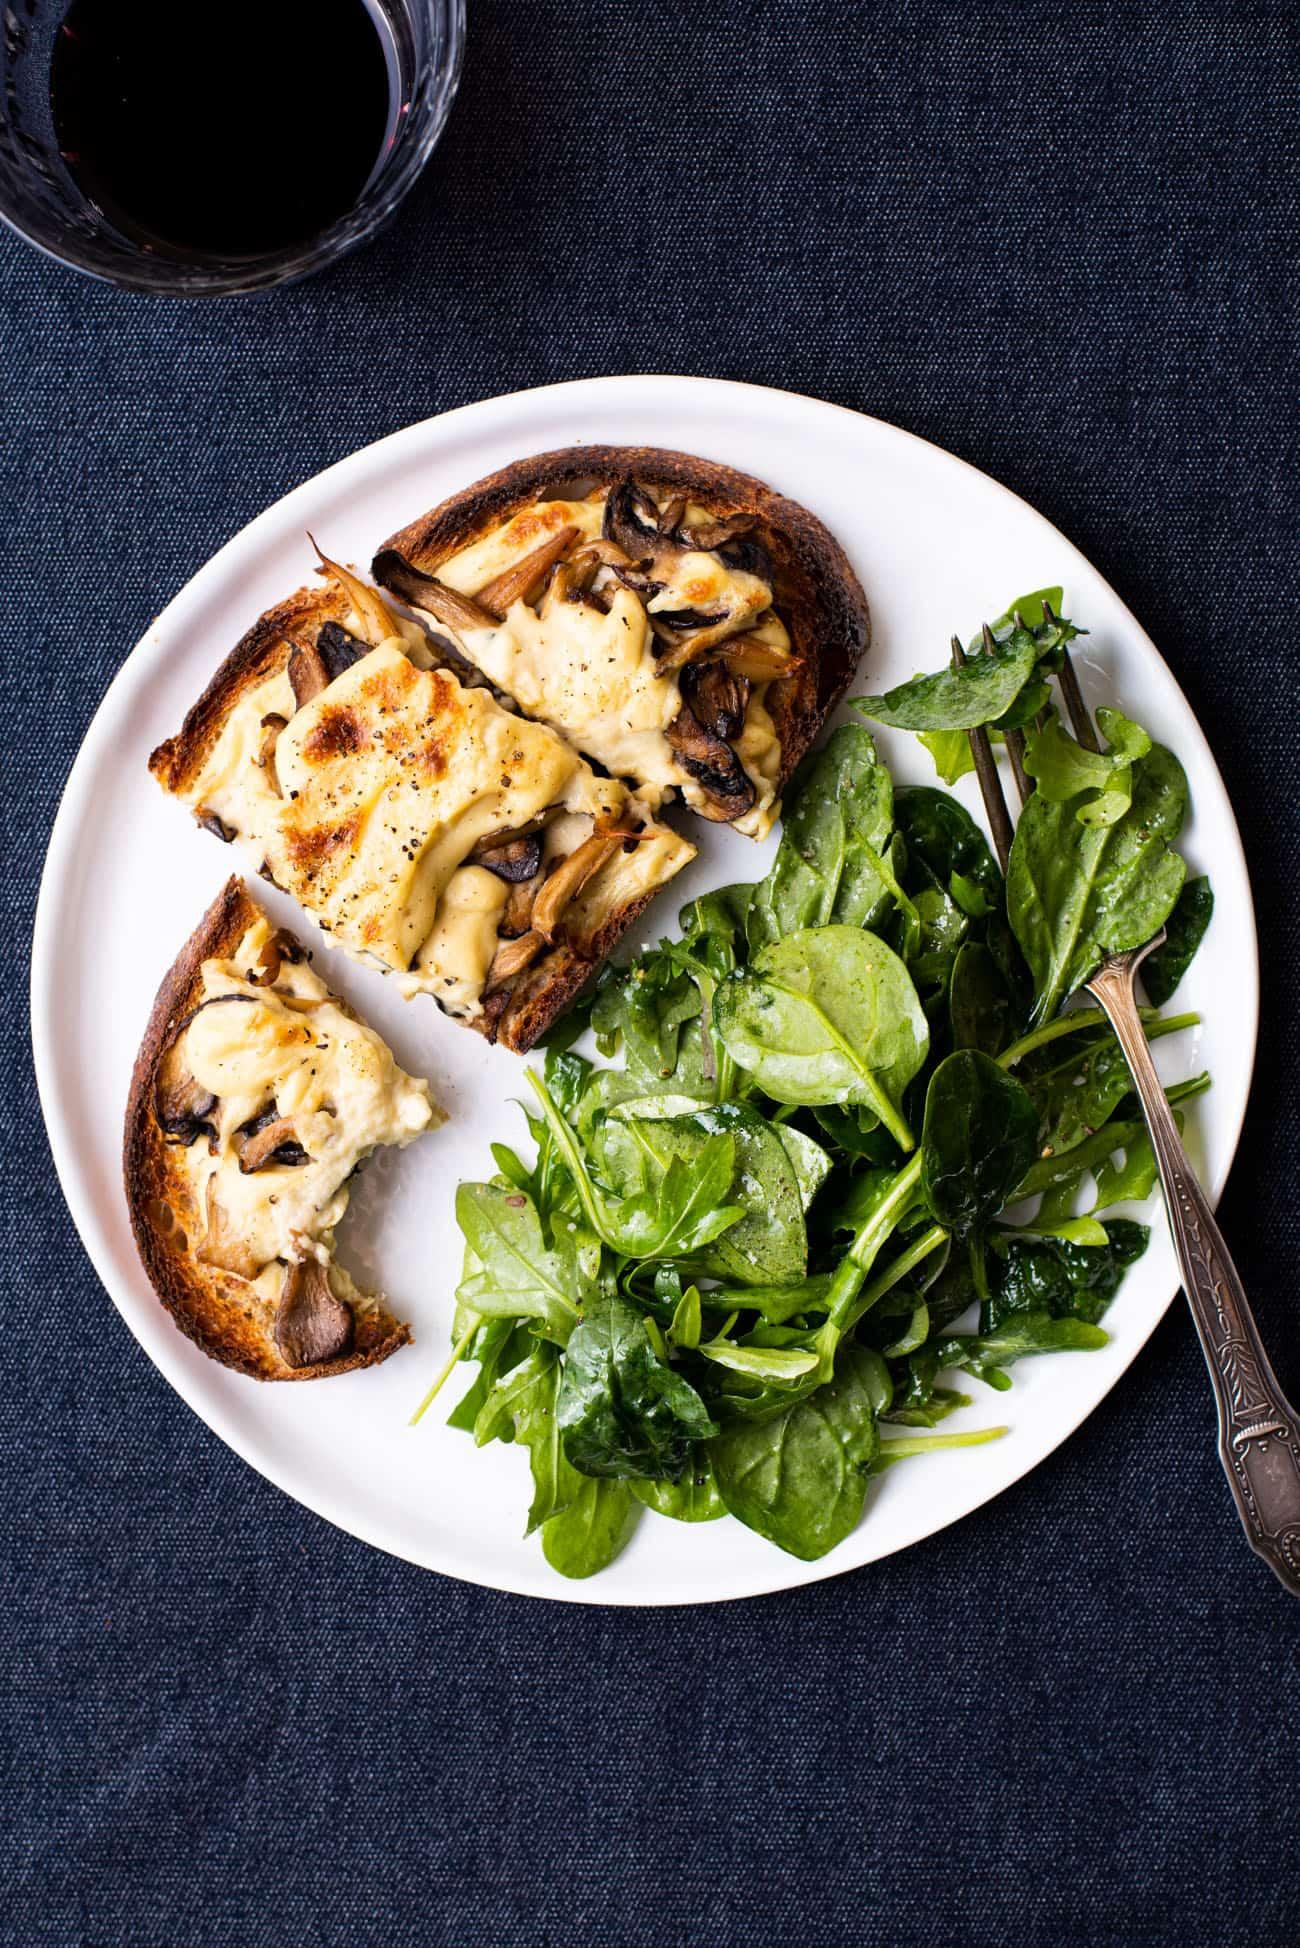 Creamy vegan mushroom tartine on a white plate with green salad.